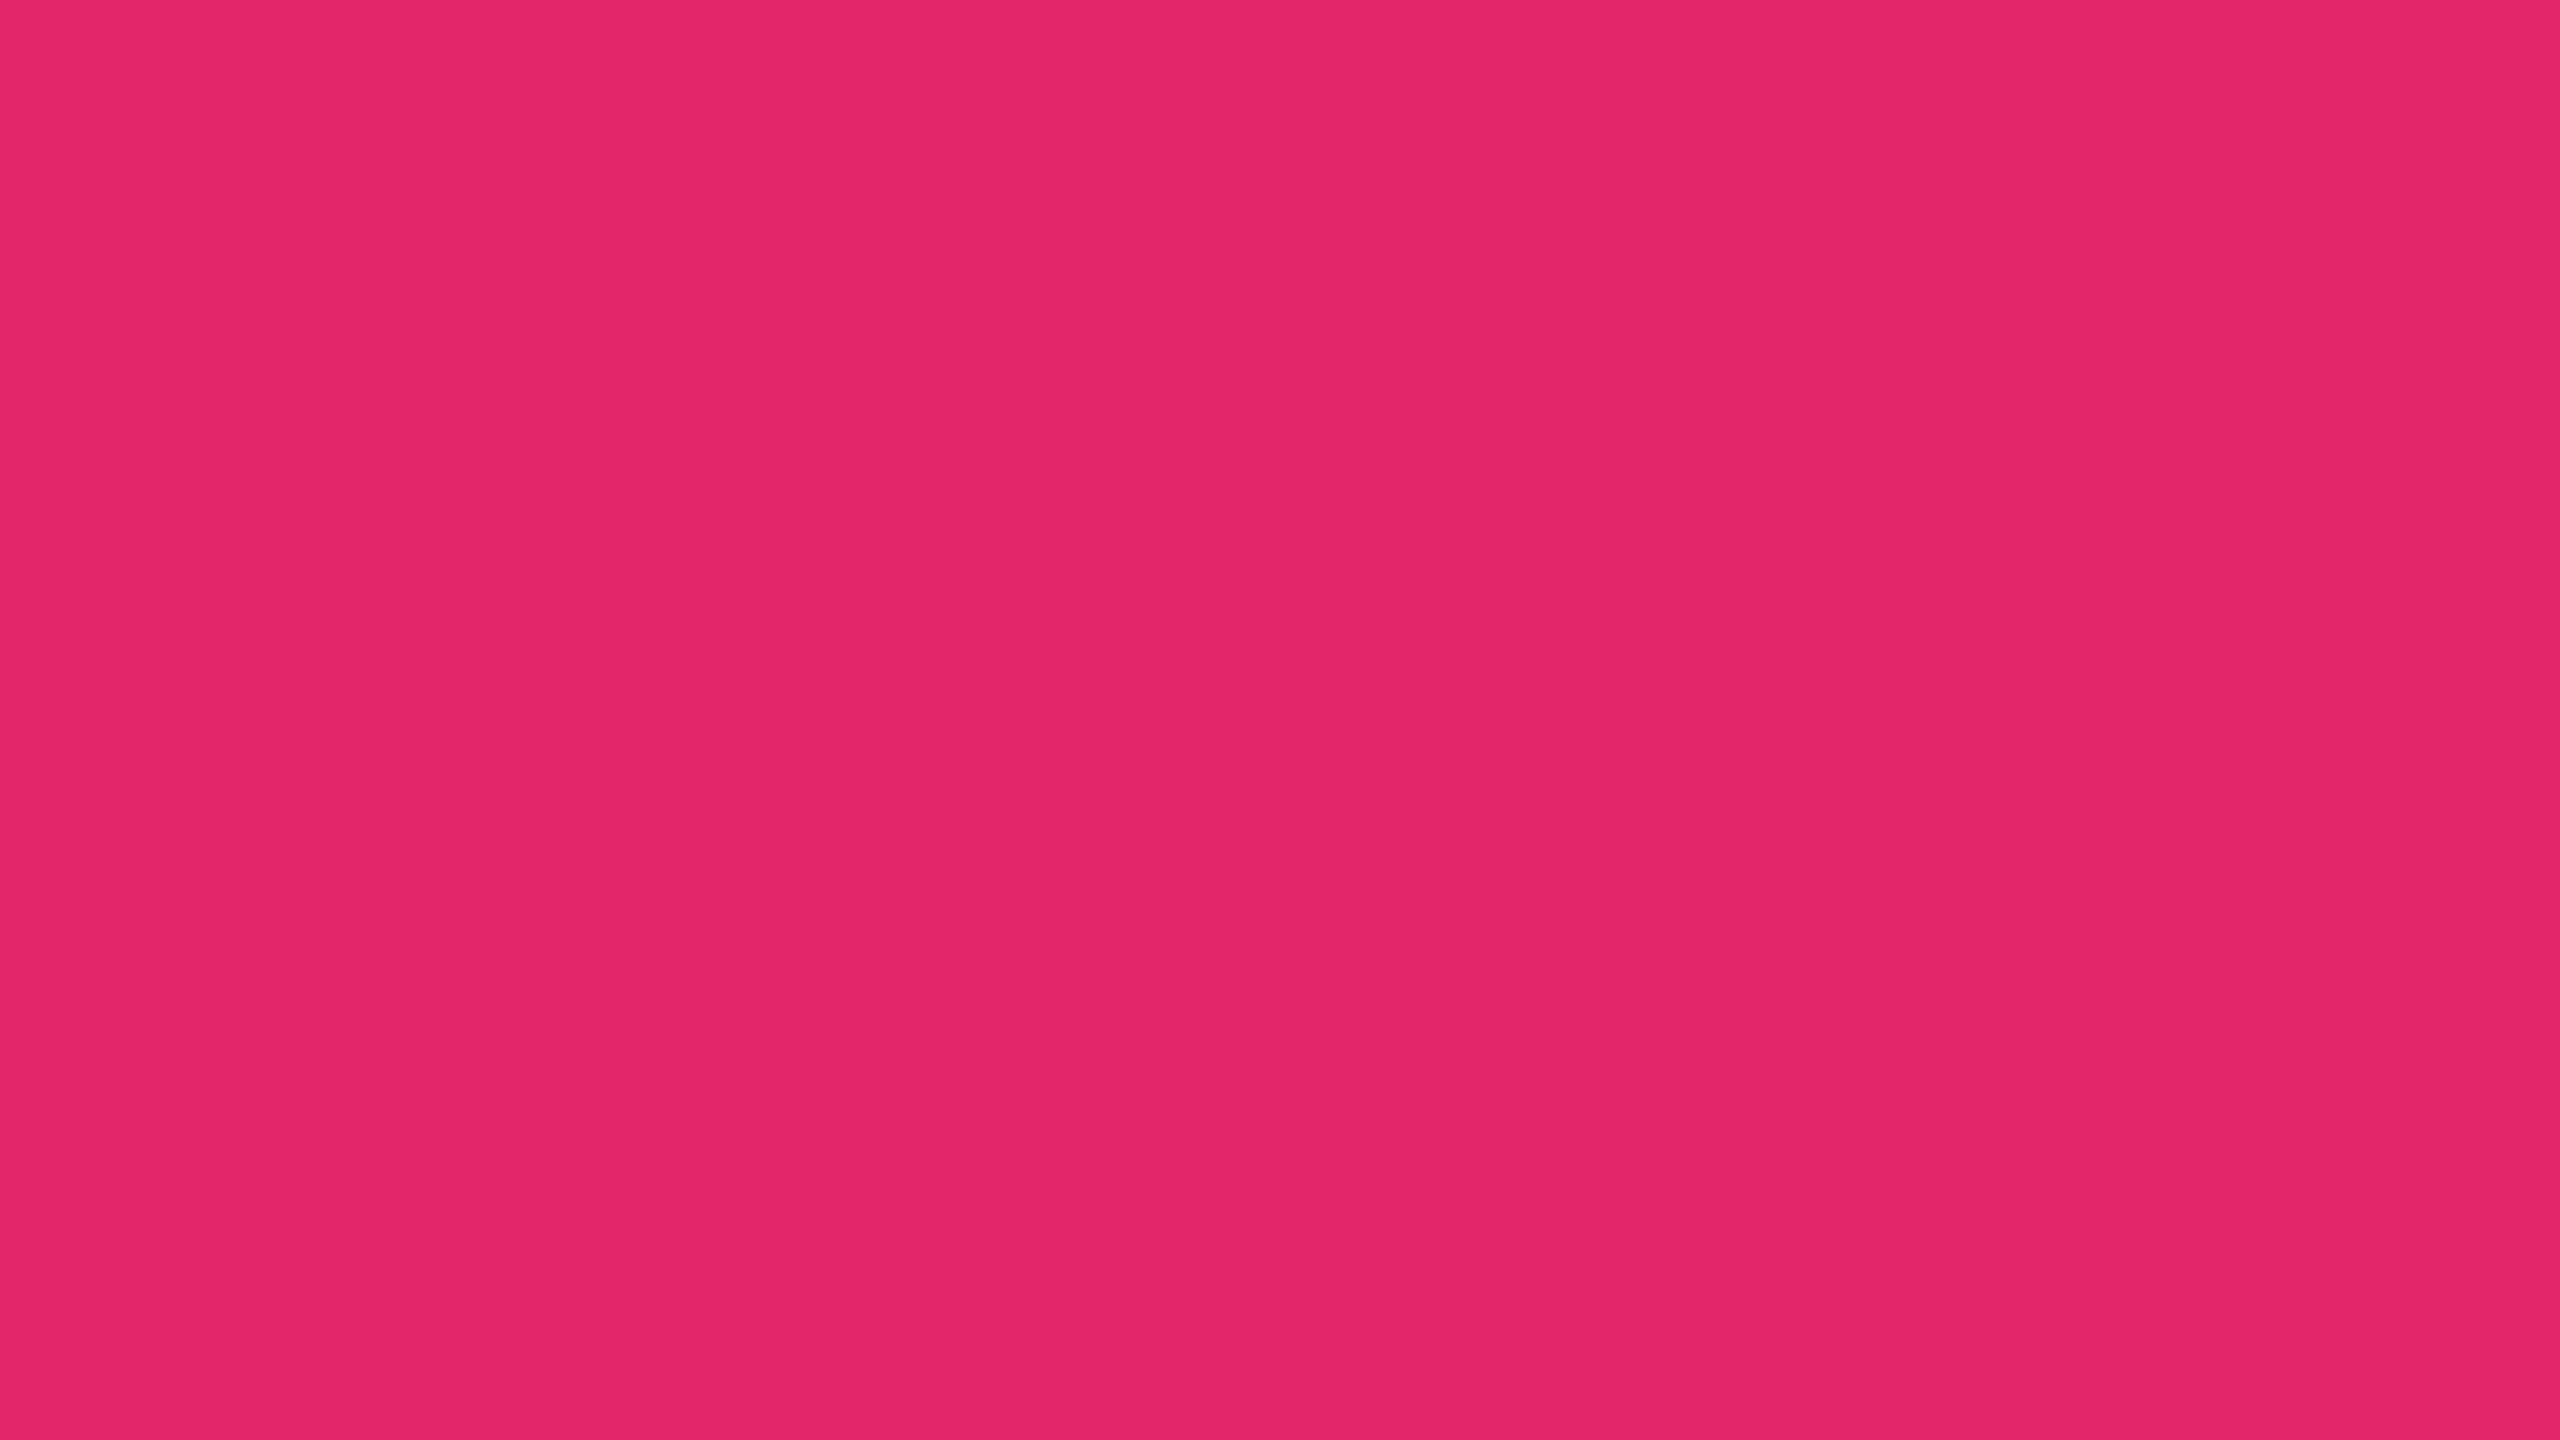 2560x1440 Razzmatazz Solid Color Background